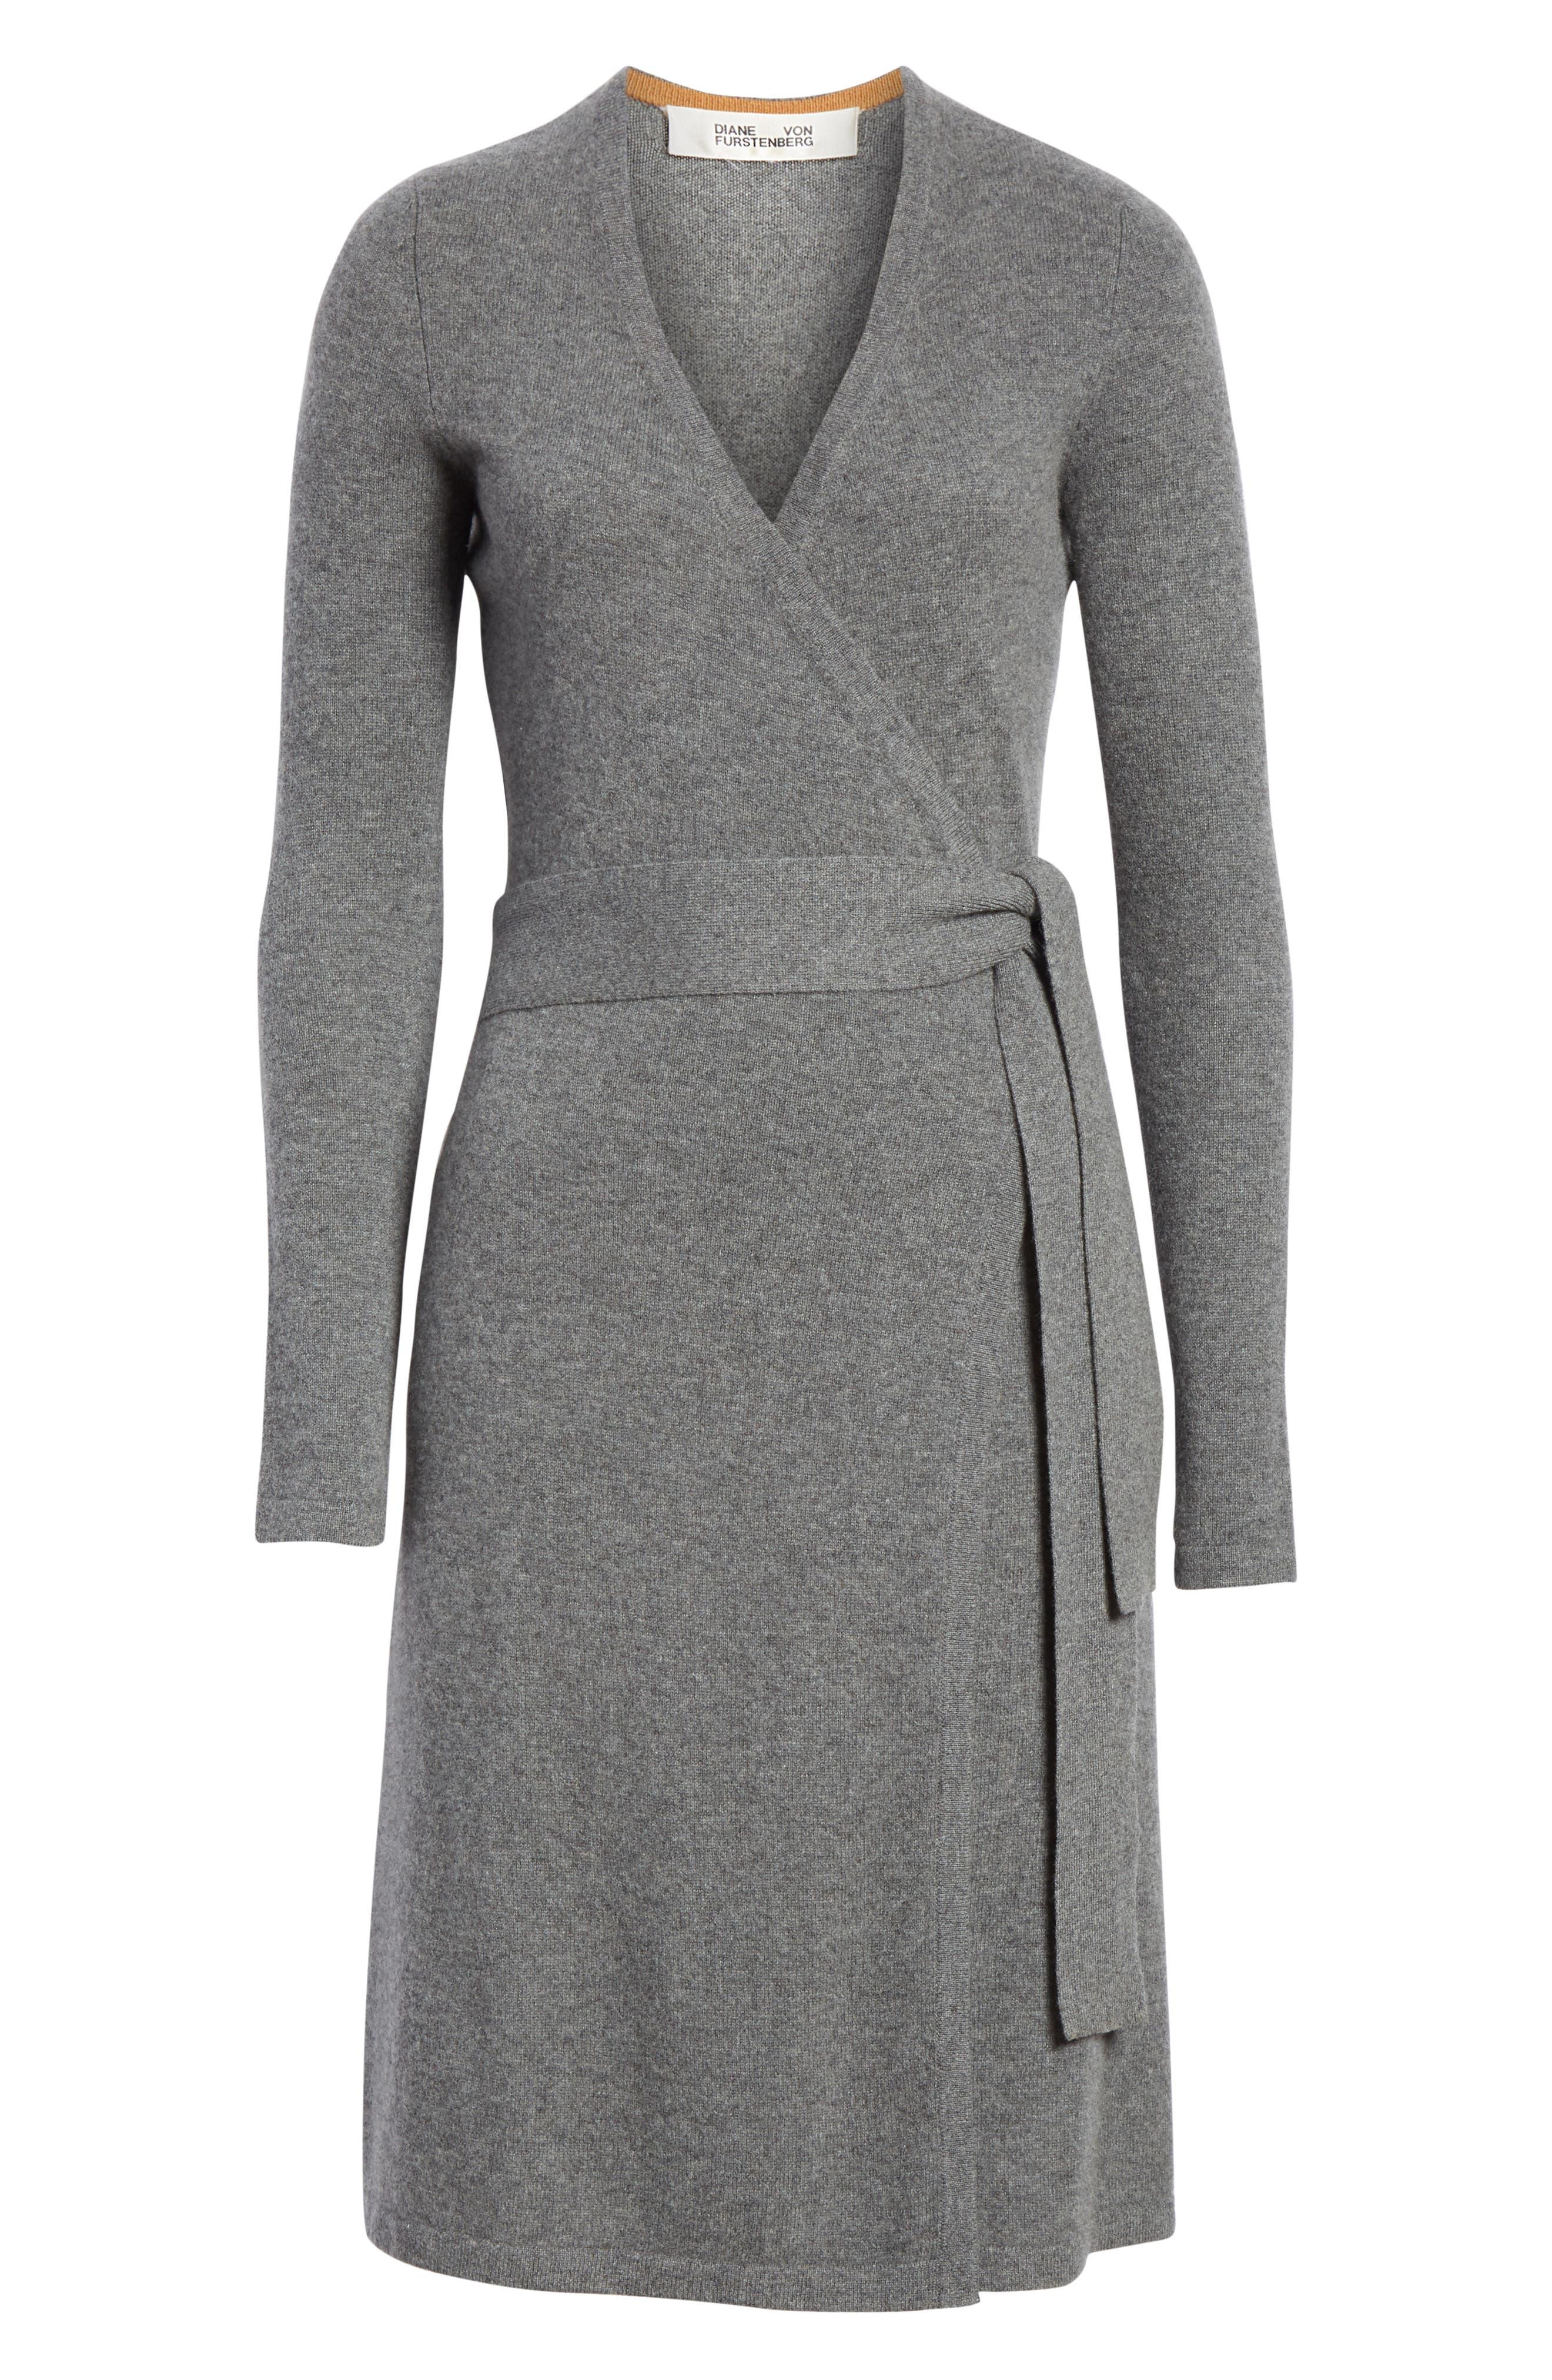 Diane Von Furstenberg Linda Cashmere Wrap Dress,                             Alternate thumbnail 6, color,                             001